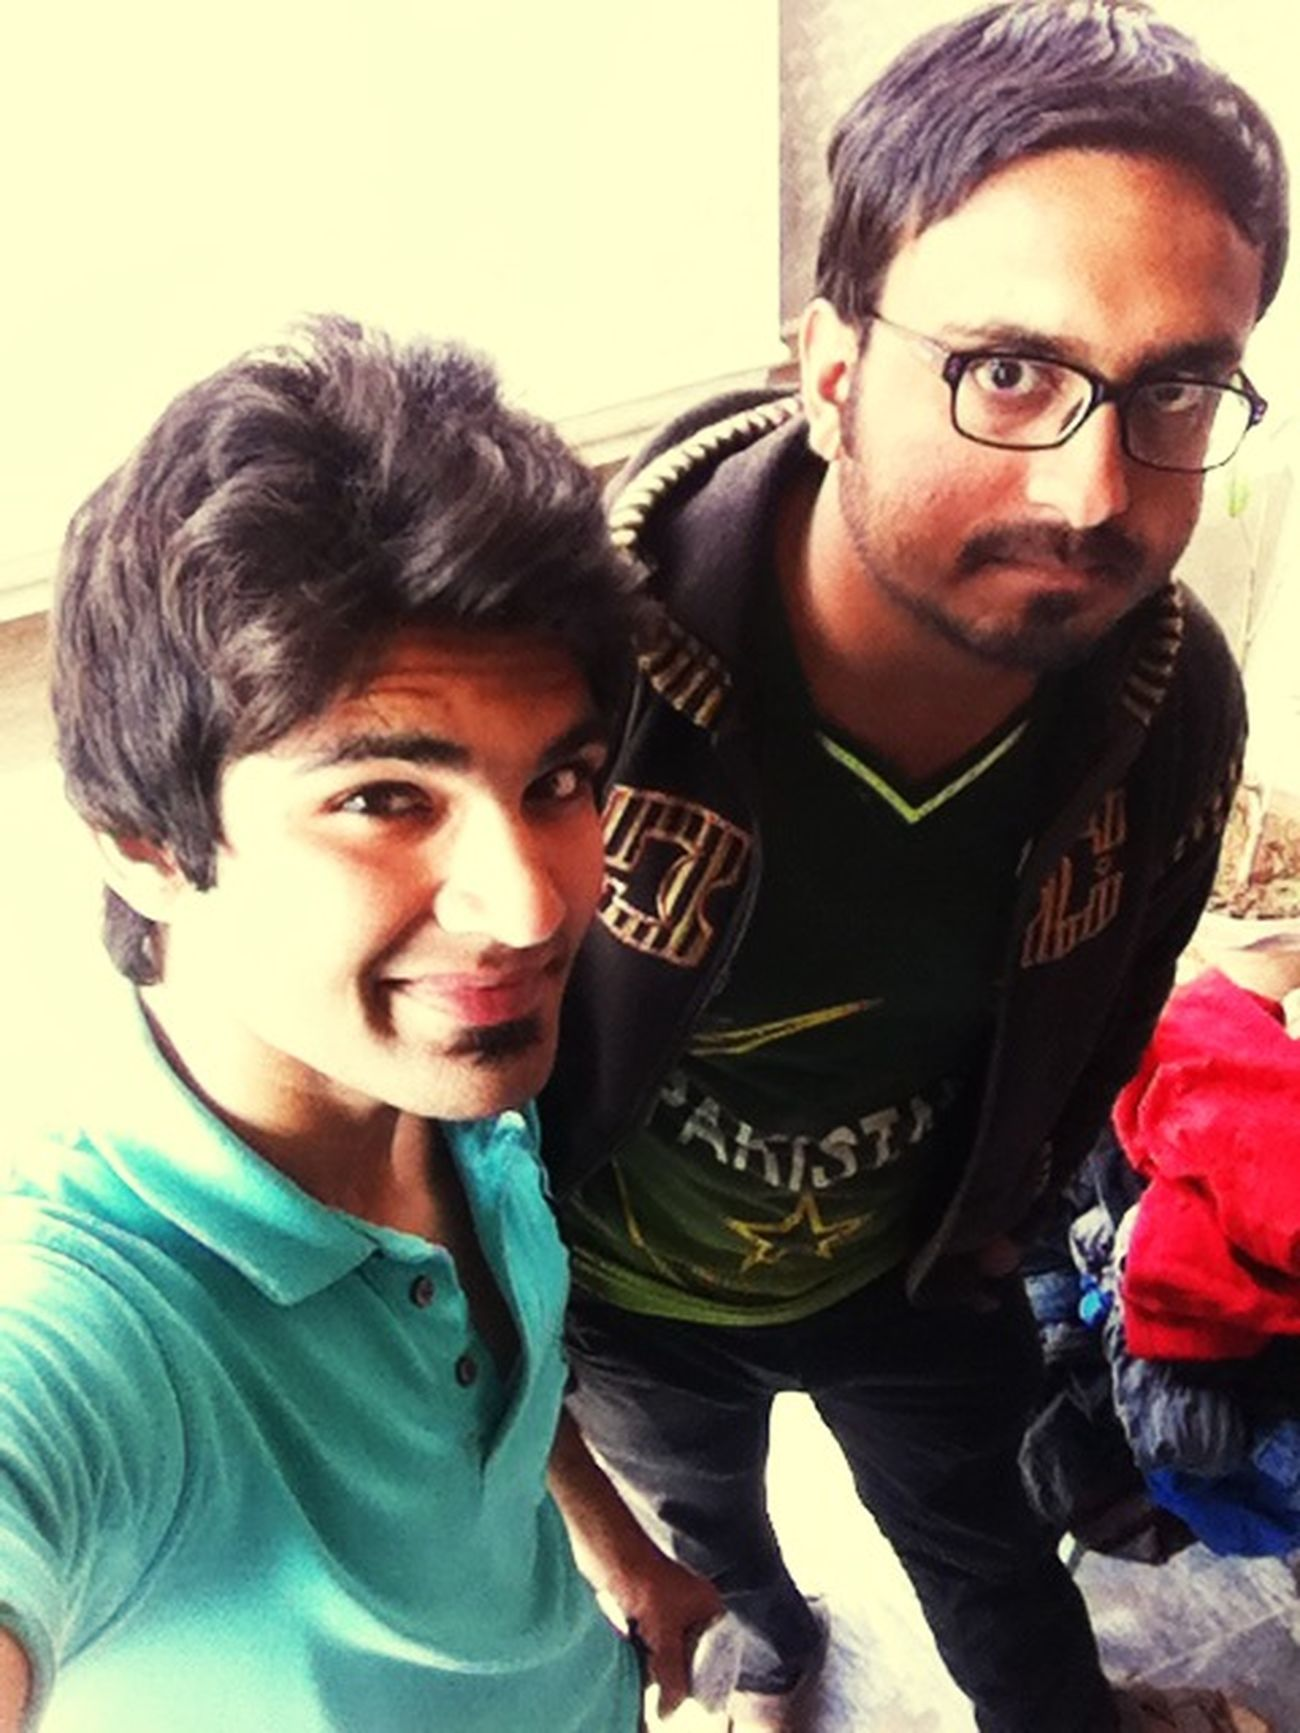 Pakcricket Match Extmfun Selfieee ✌️